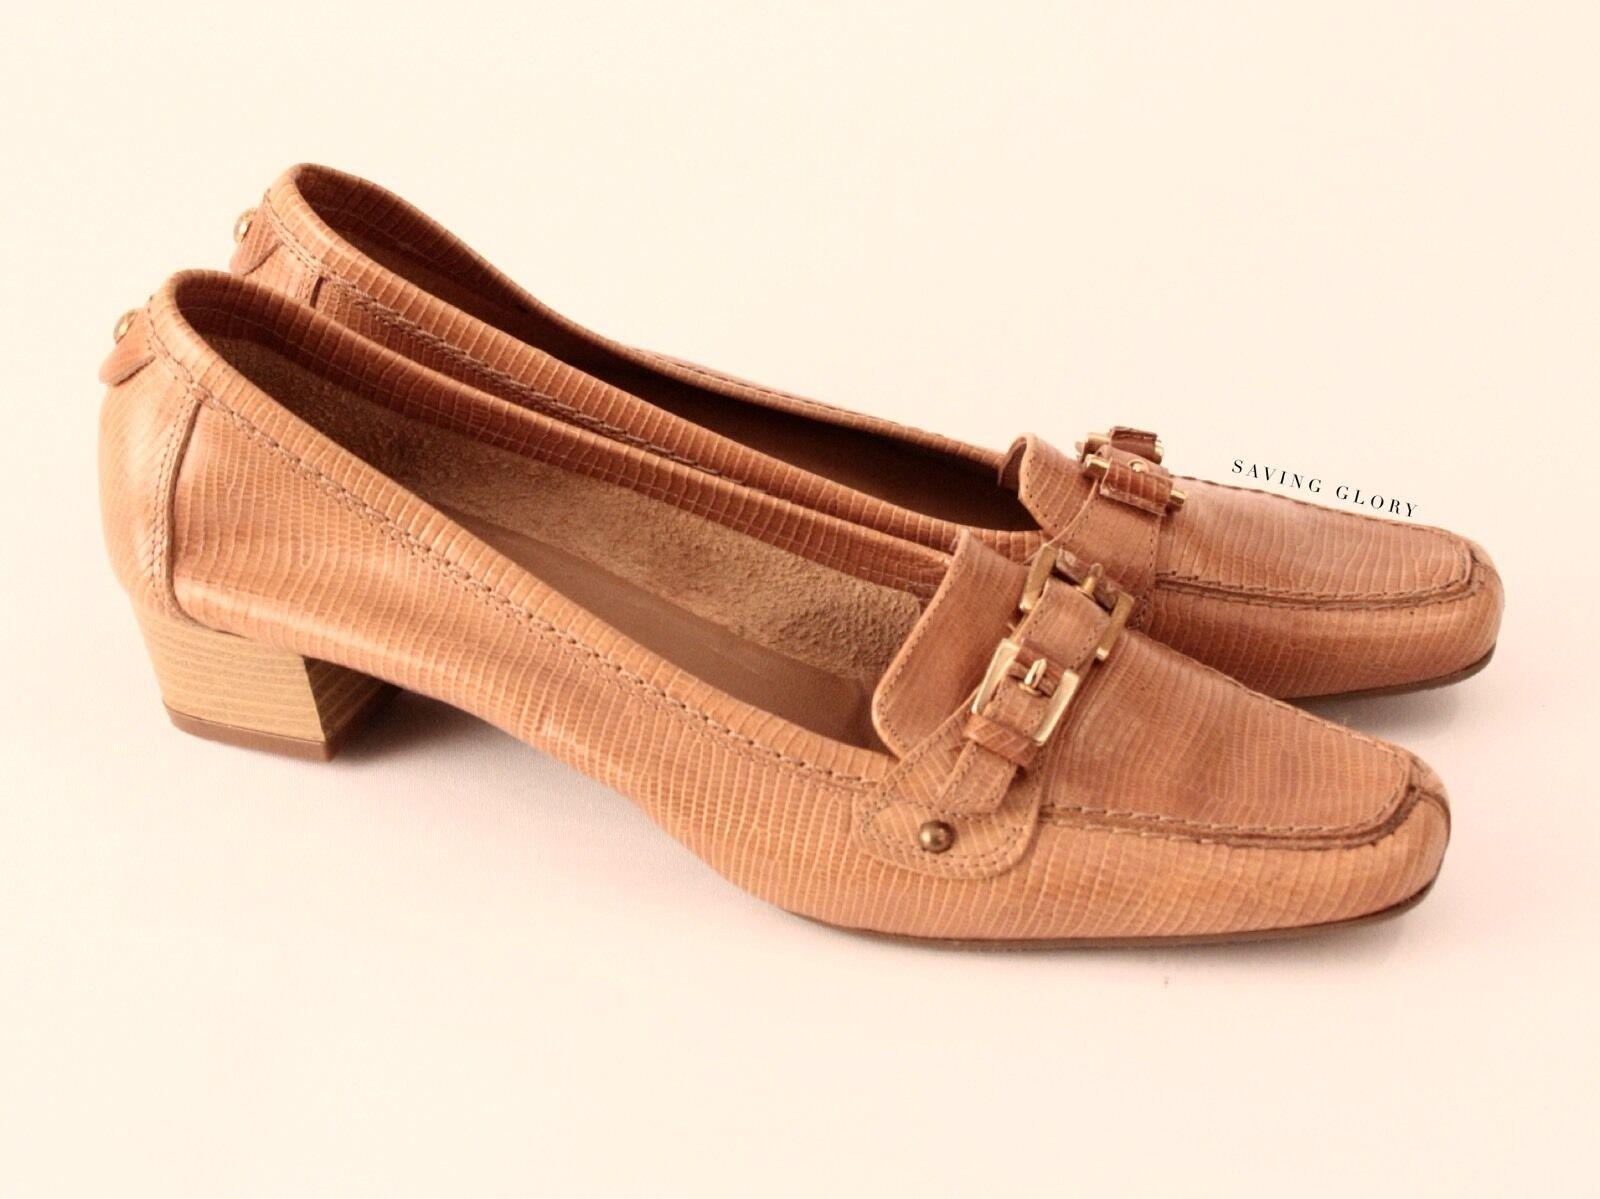 #savingglory Aura by LODI Camel Tan Leder Loafers Made in Spain 40.5 AU 9.5